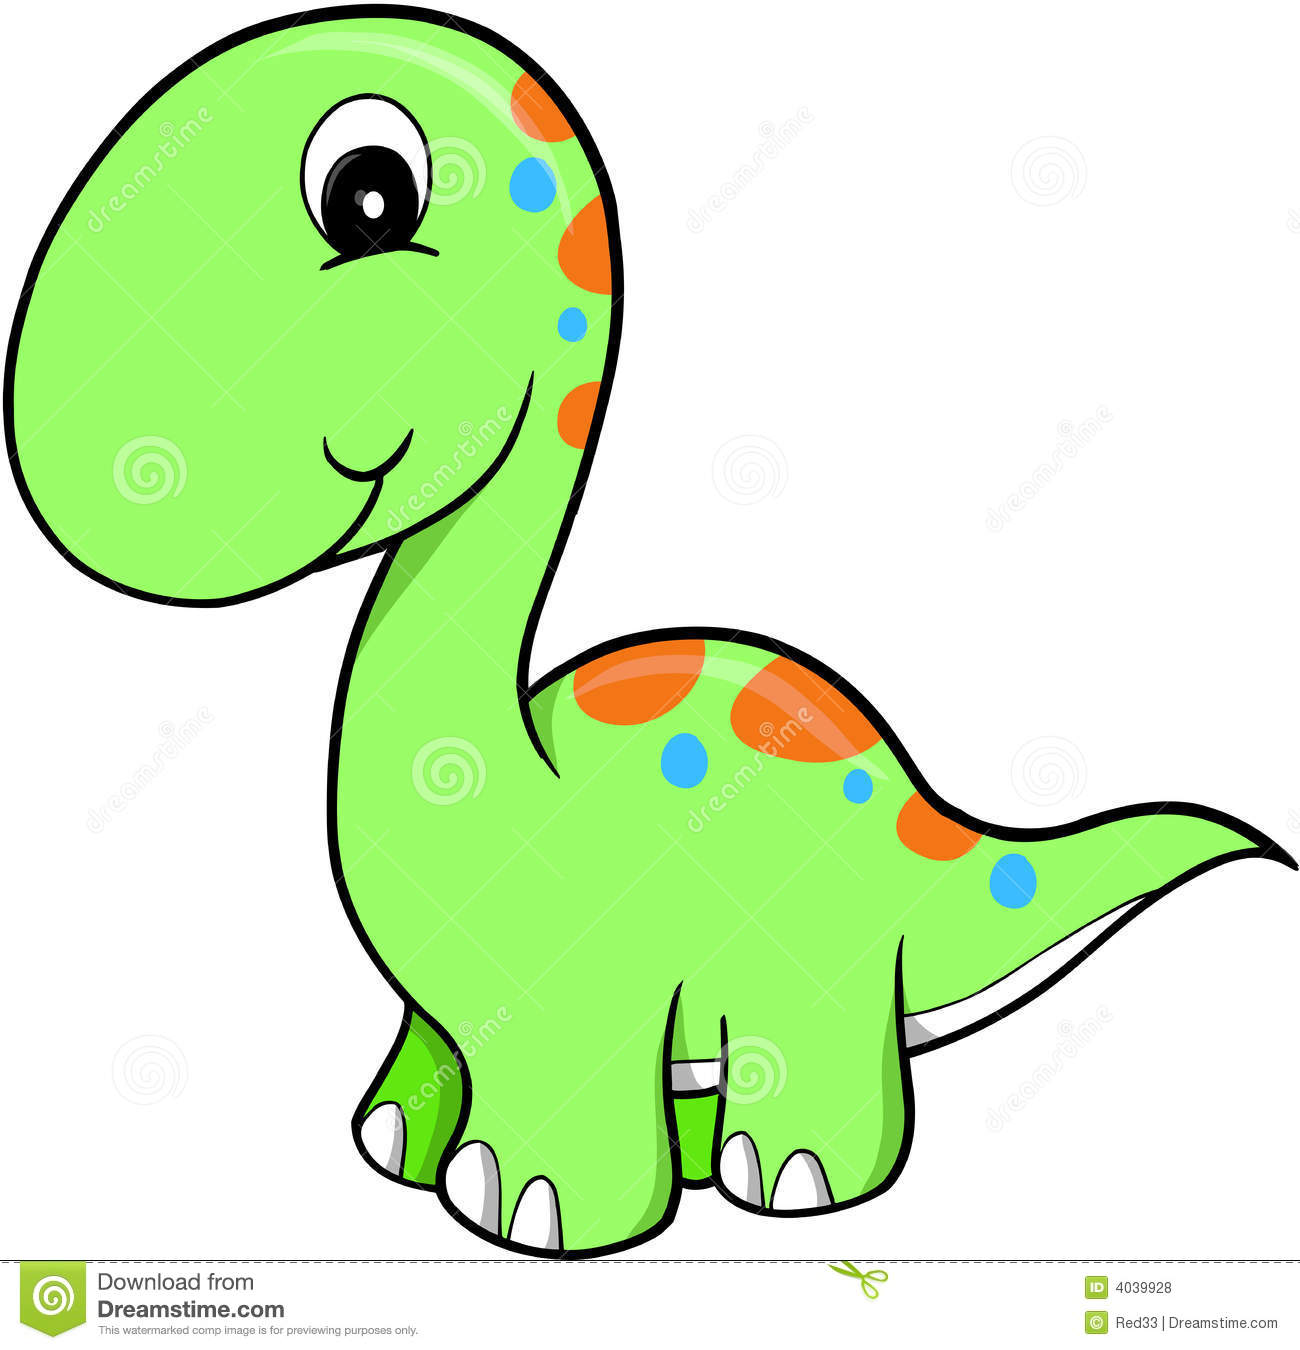 Baby Dinosaur Clipart | Free download best Baby Dinosaur Clipart on ... jpg stock